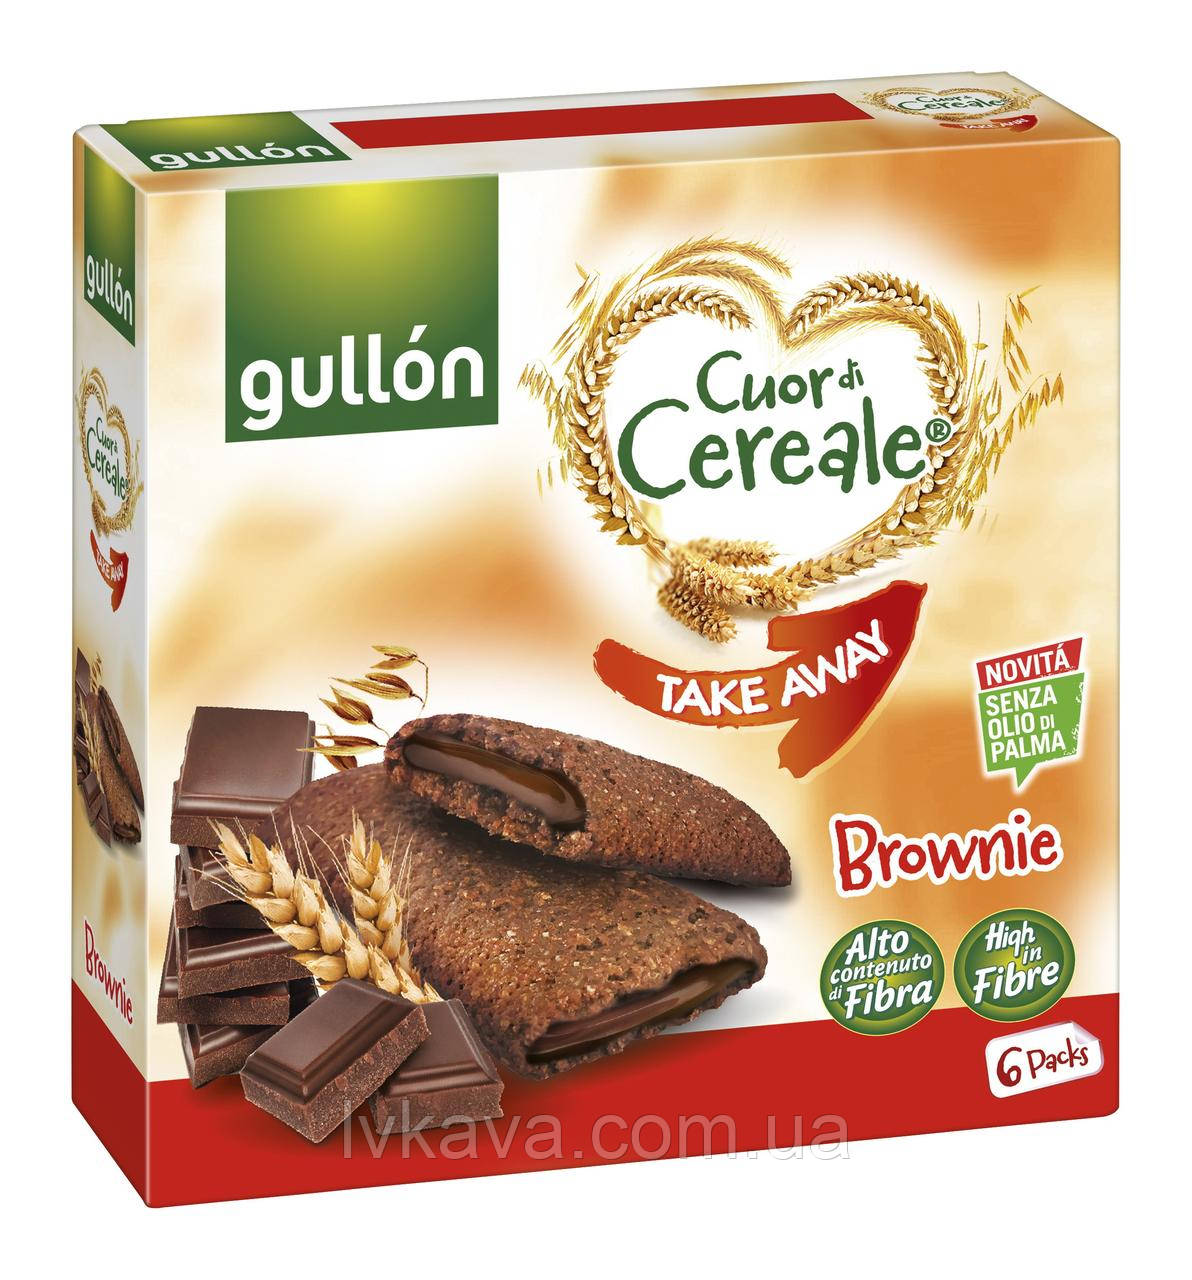 Печенье овсяное  Gullon Cuor di Cereale Take Away Brownie , 202 гр